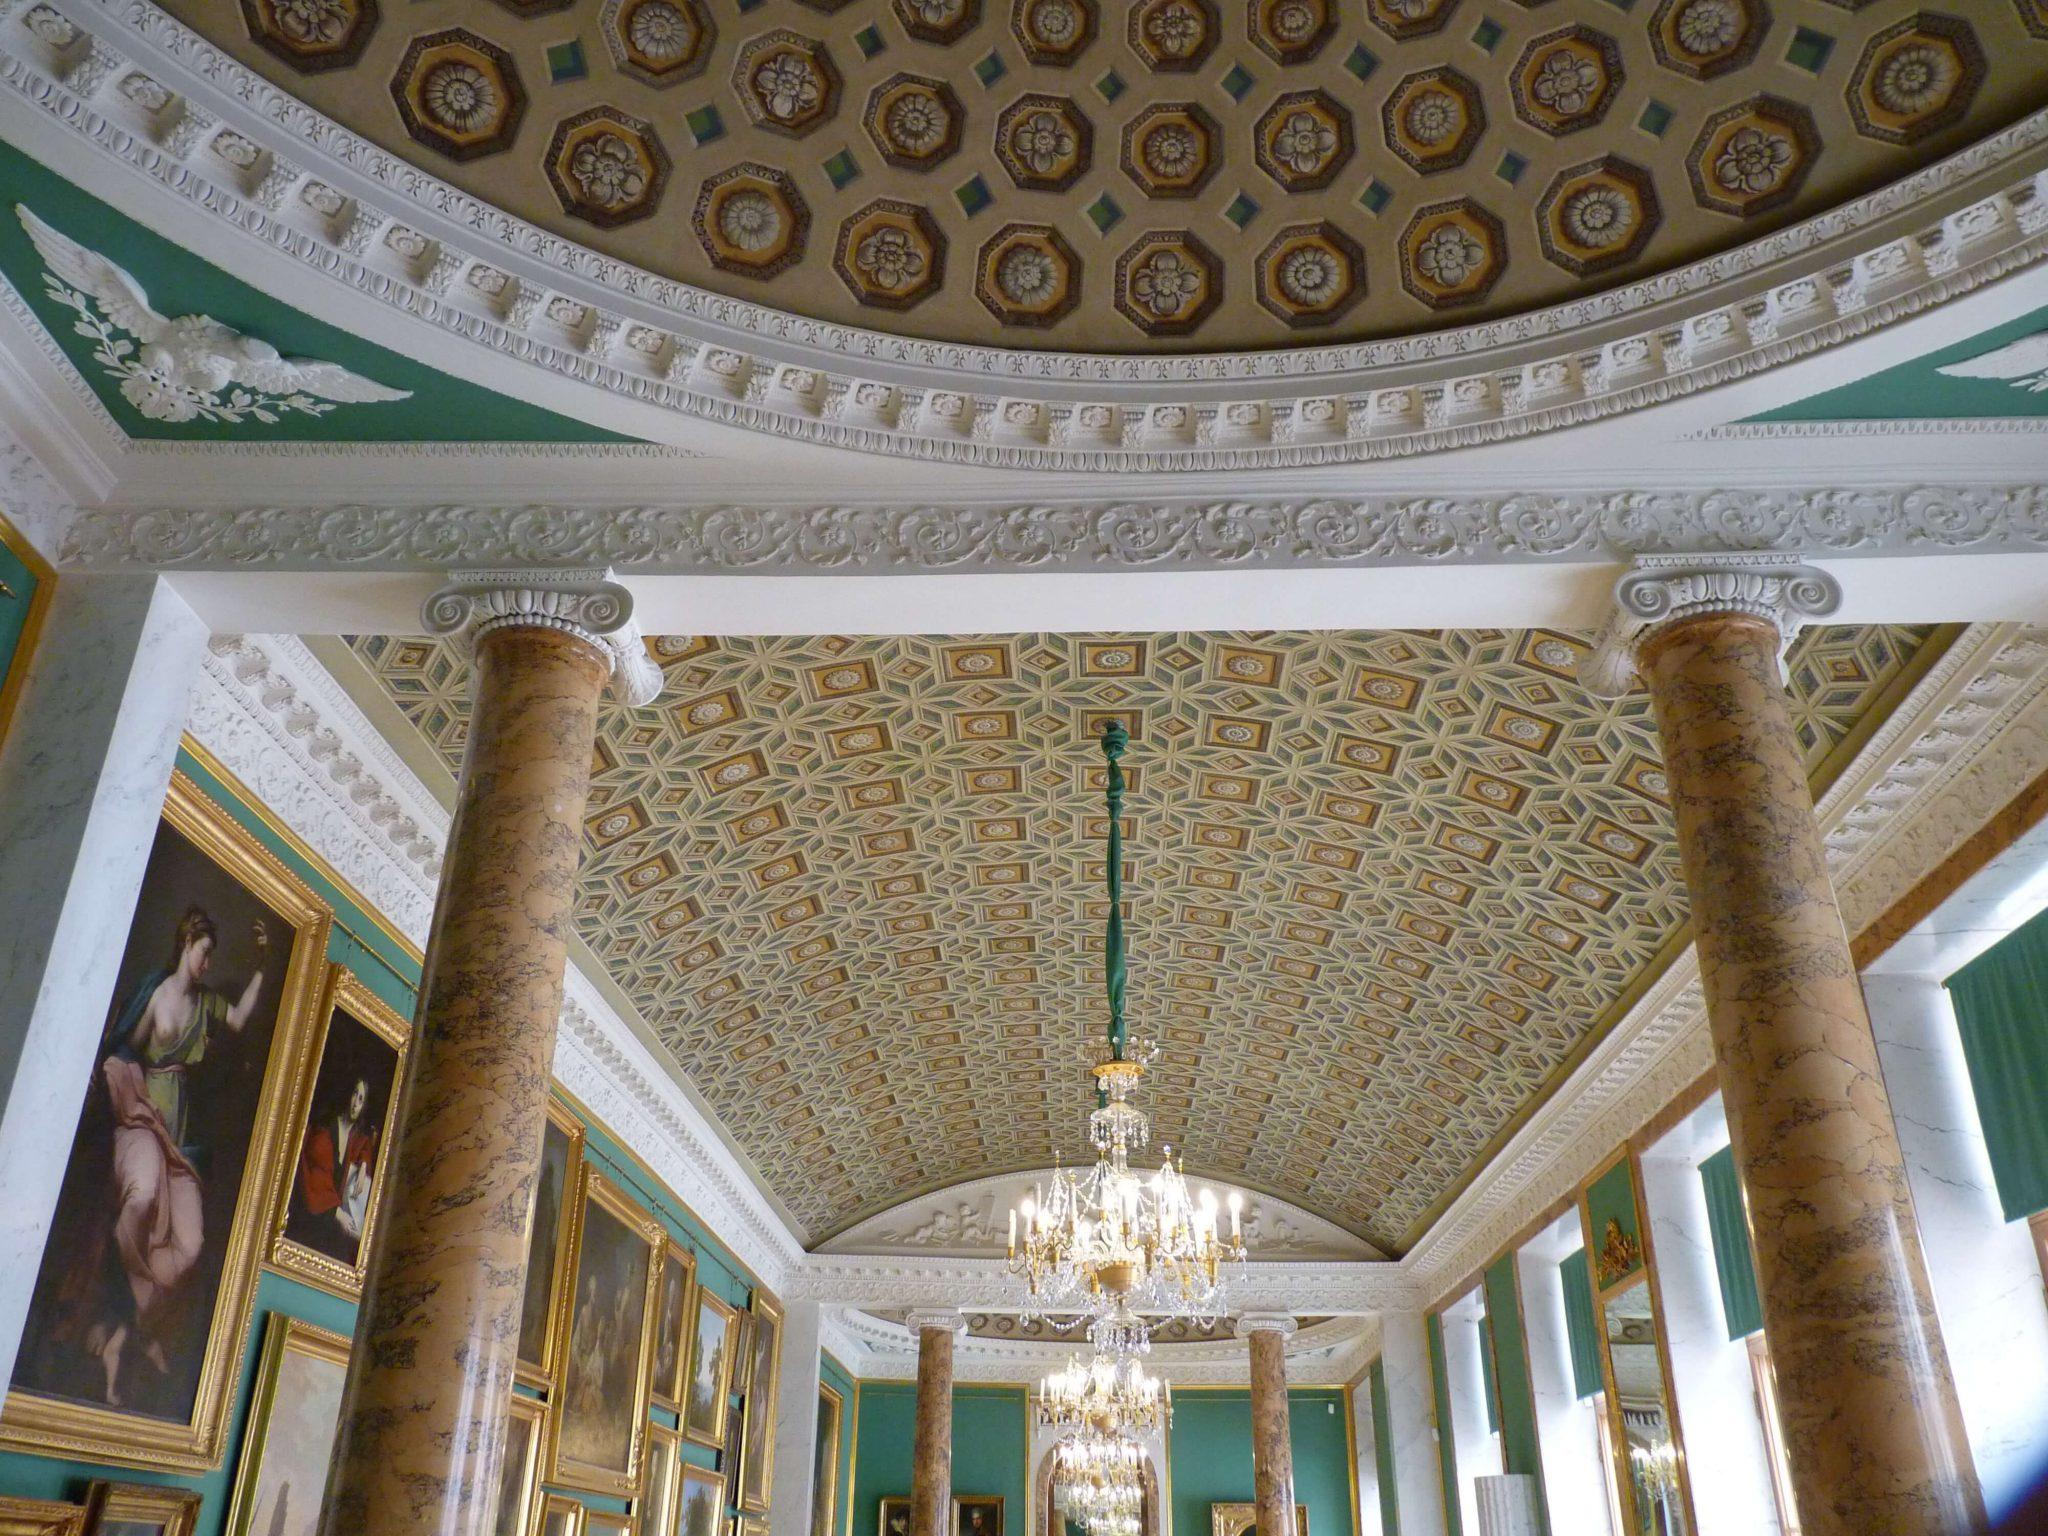 Palácio Stroganovsky interior 02 São Petersburgo Rússia Mundo Indefinido